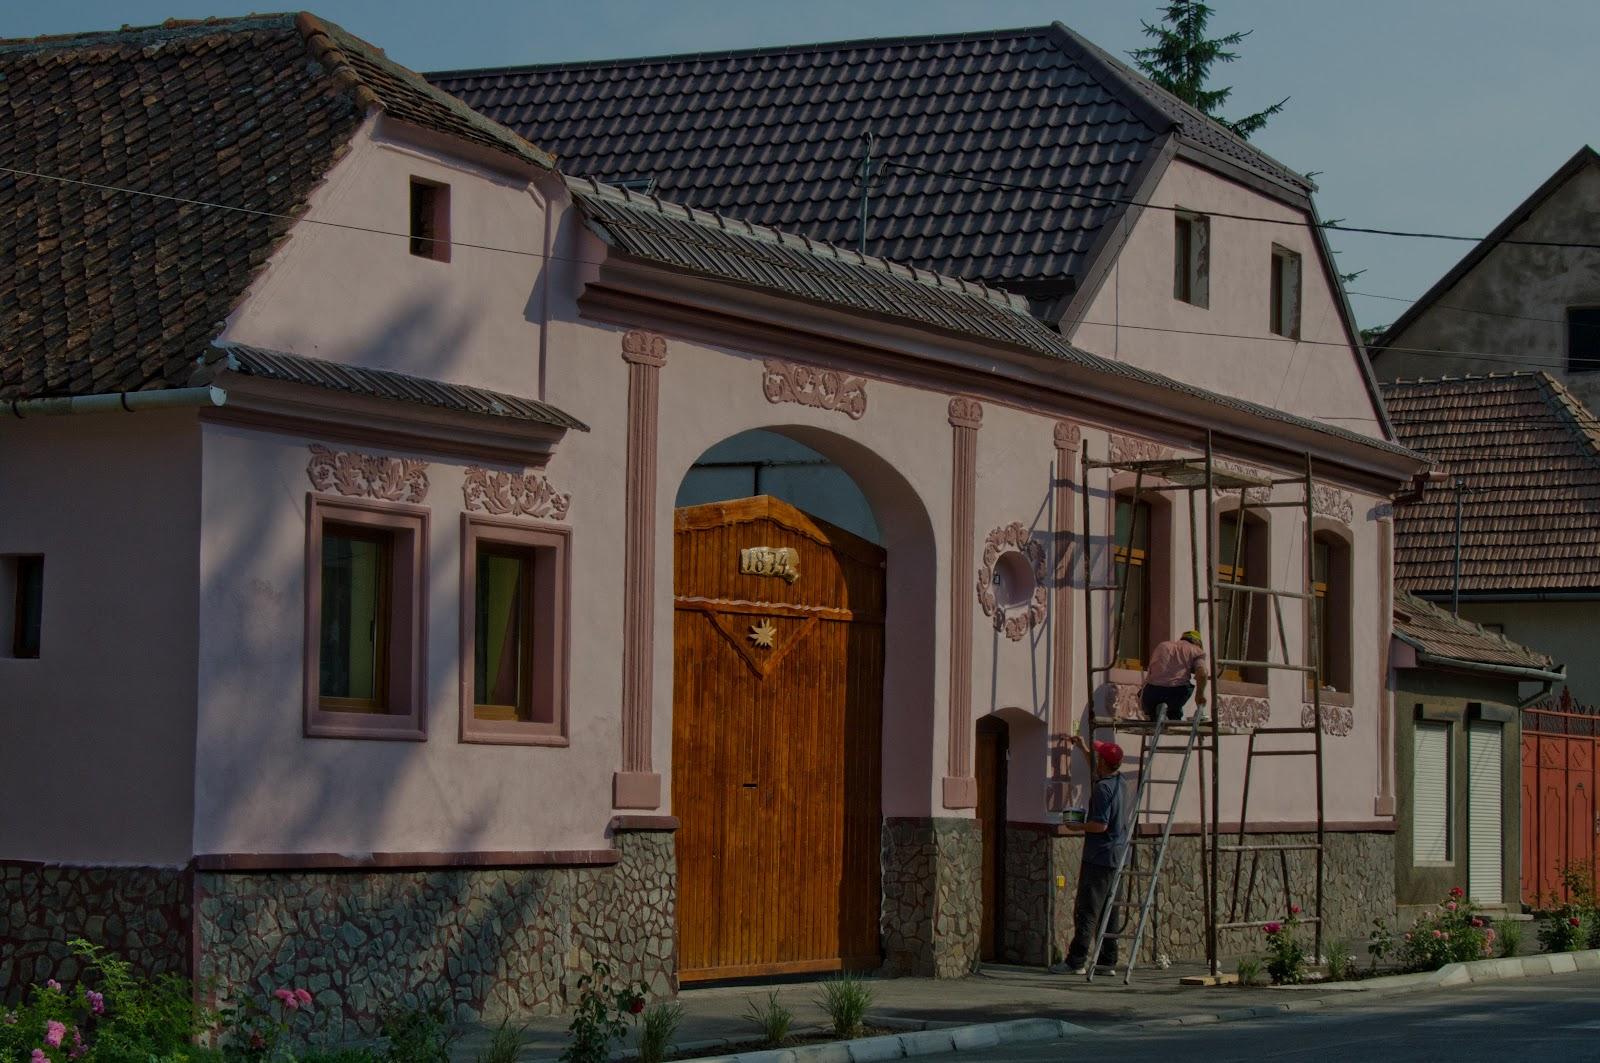 2012-06-2305rasnov-bran1